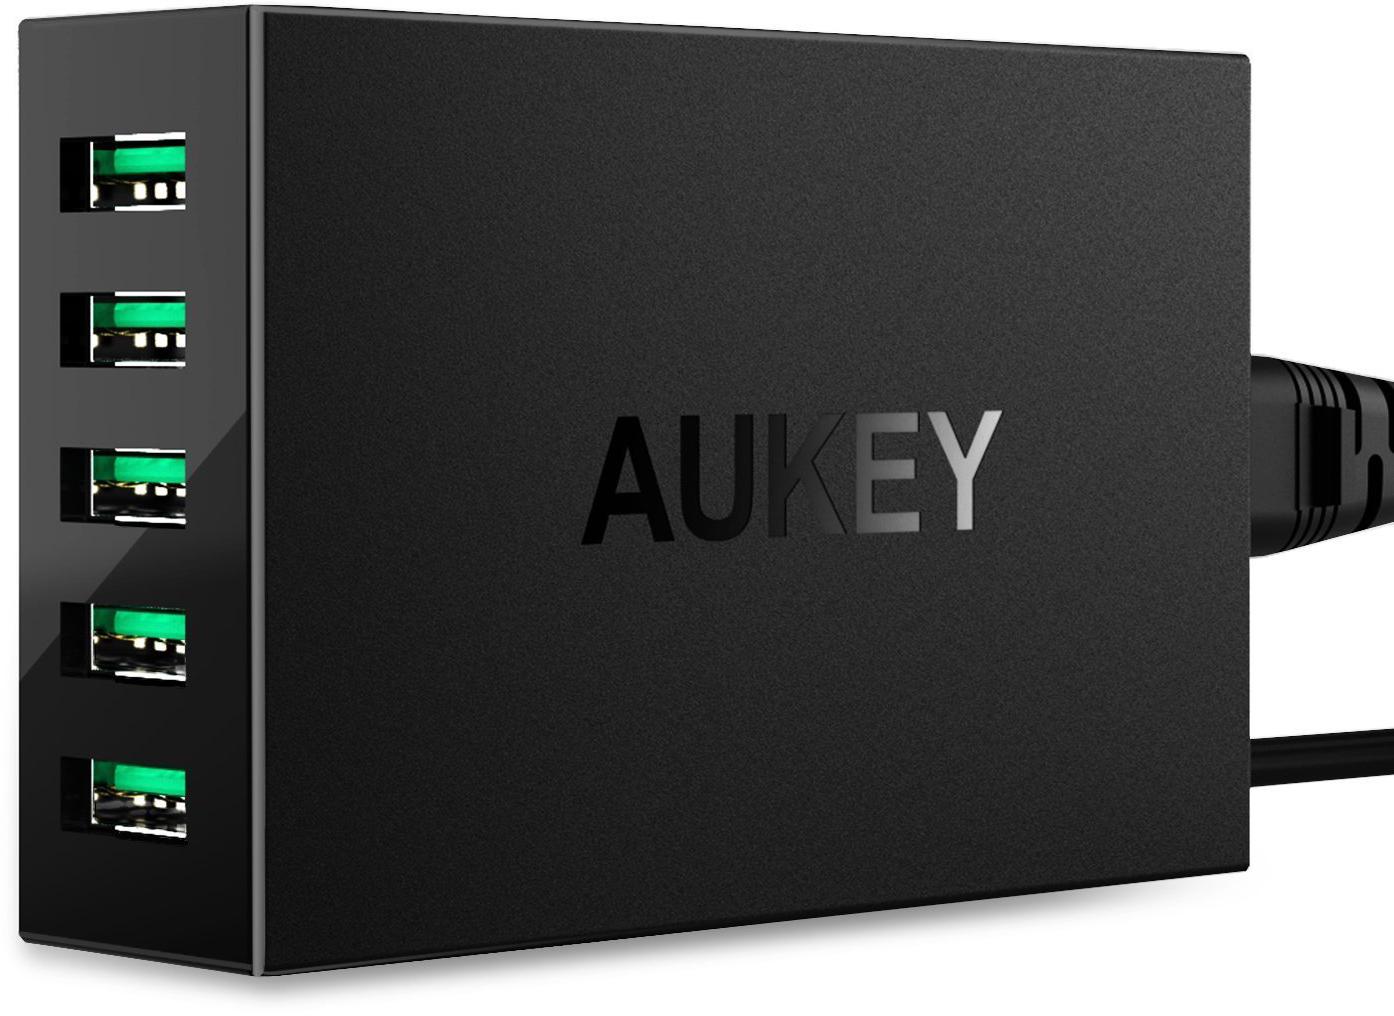 Aukey PA-U33 - сетевое зарядное устройство (Black)